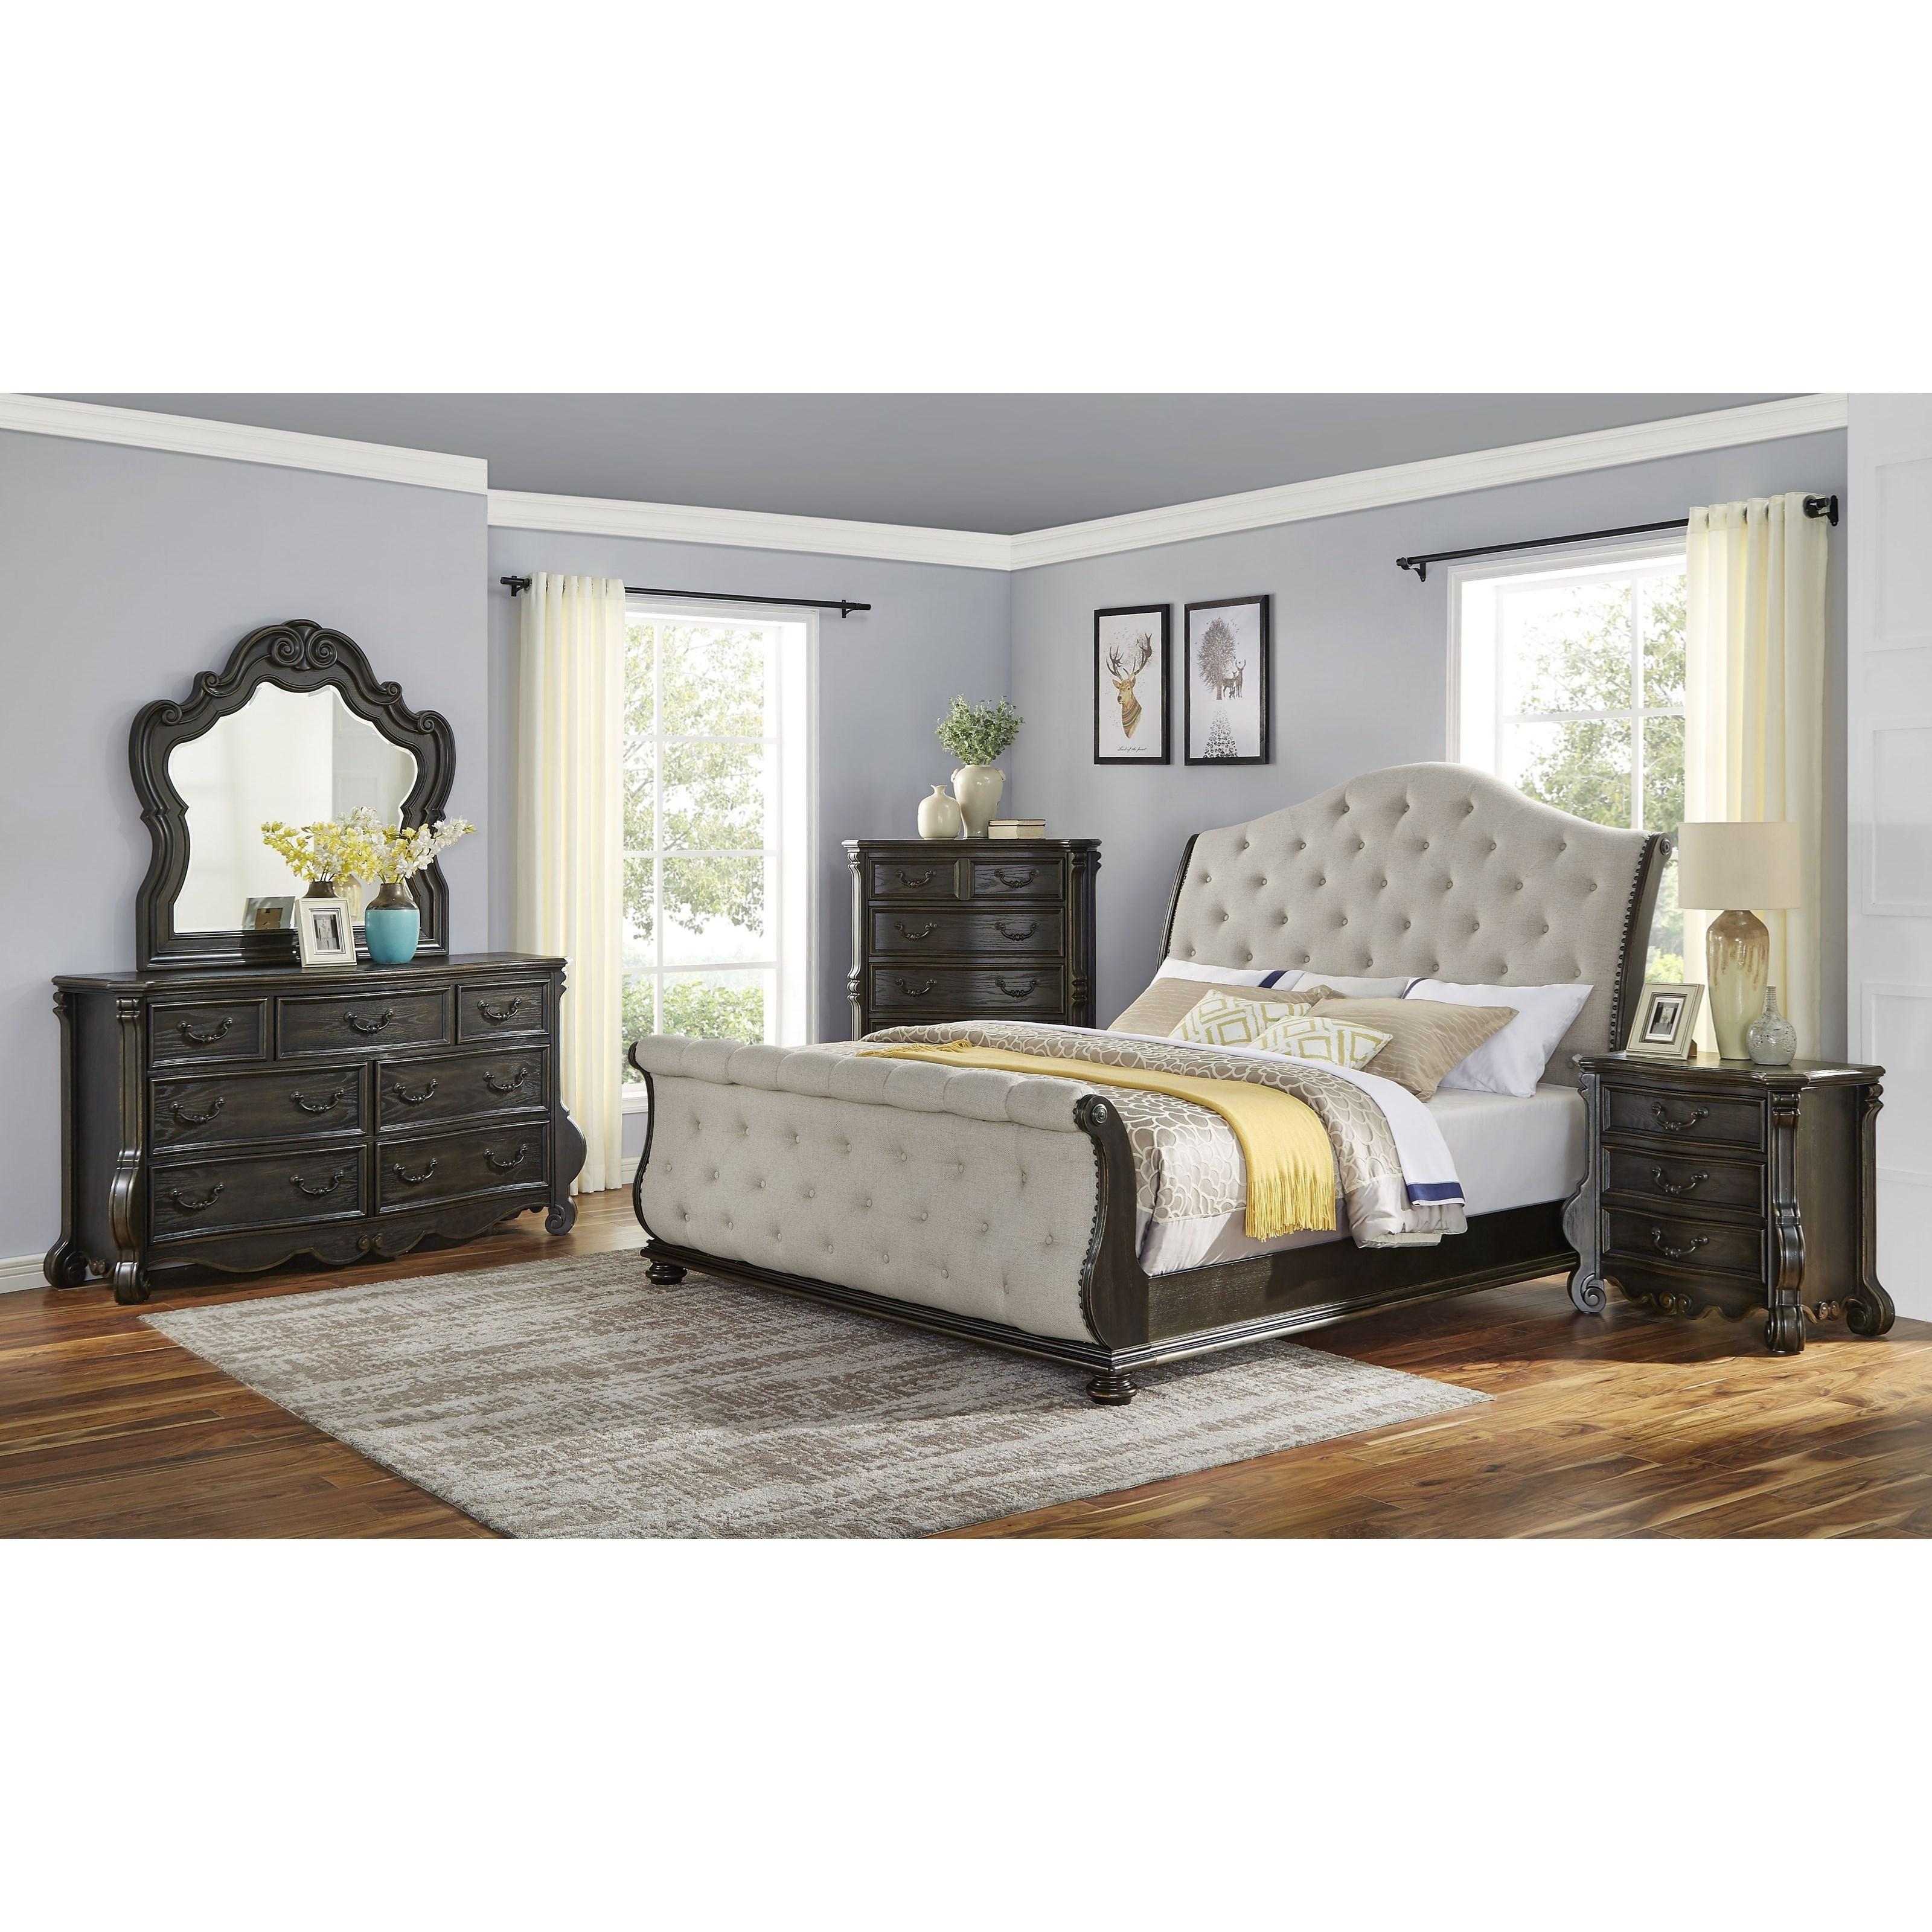 Steve Silver Rhapsody 5 Piece Queen Bedroom Set A1 Furniture Mattress Bedroom Groups